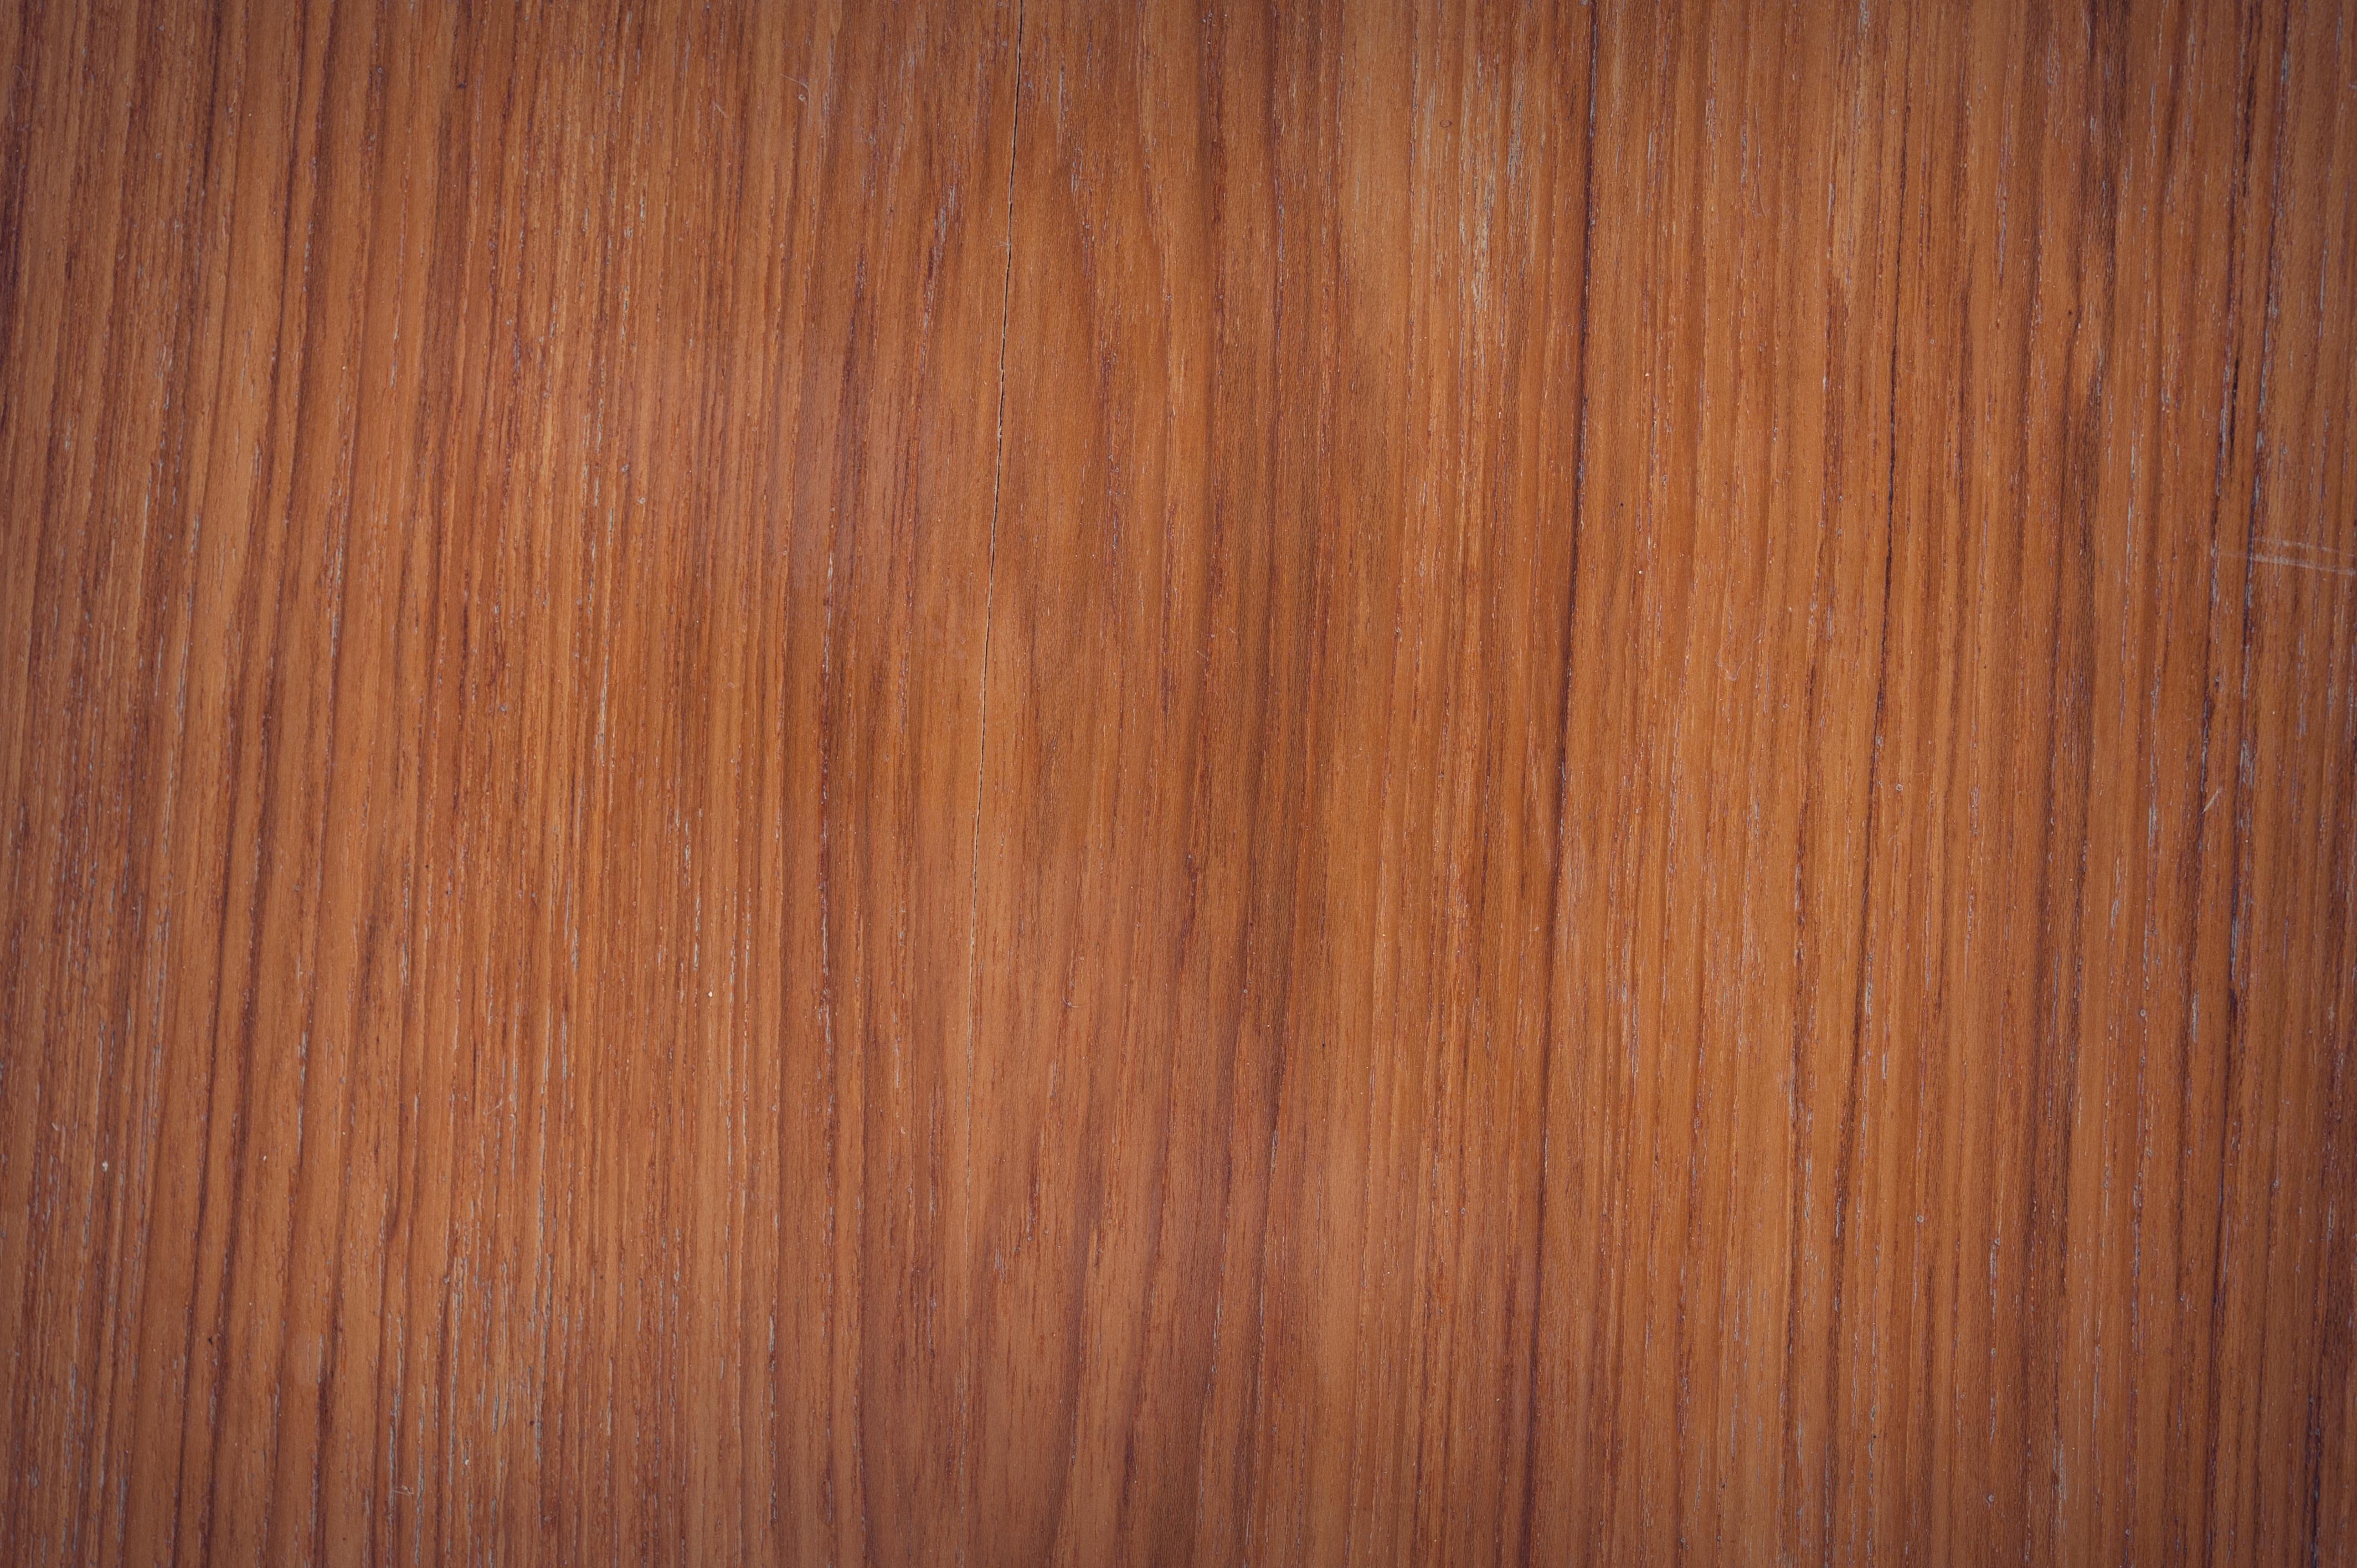 1 Red Oak Flooring Designs